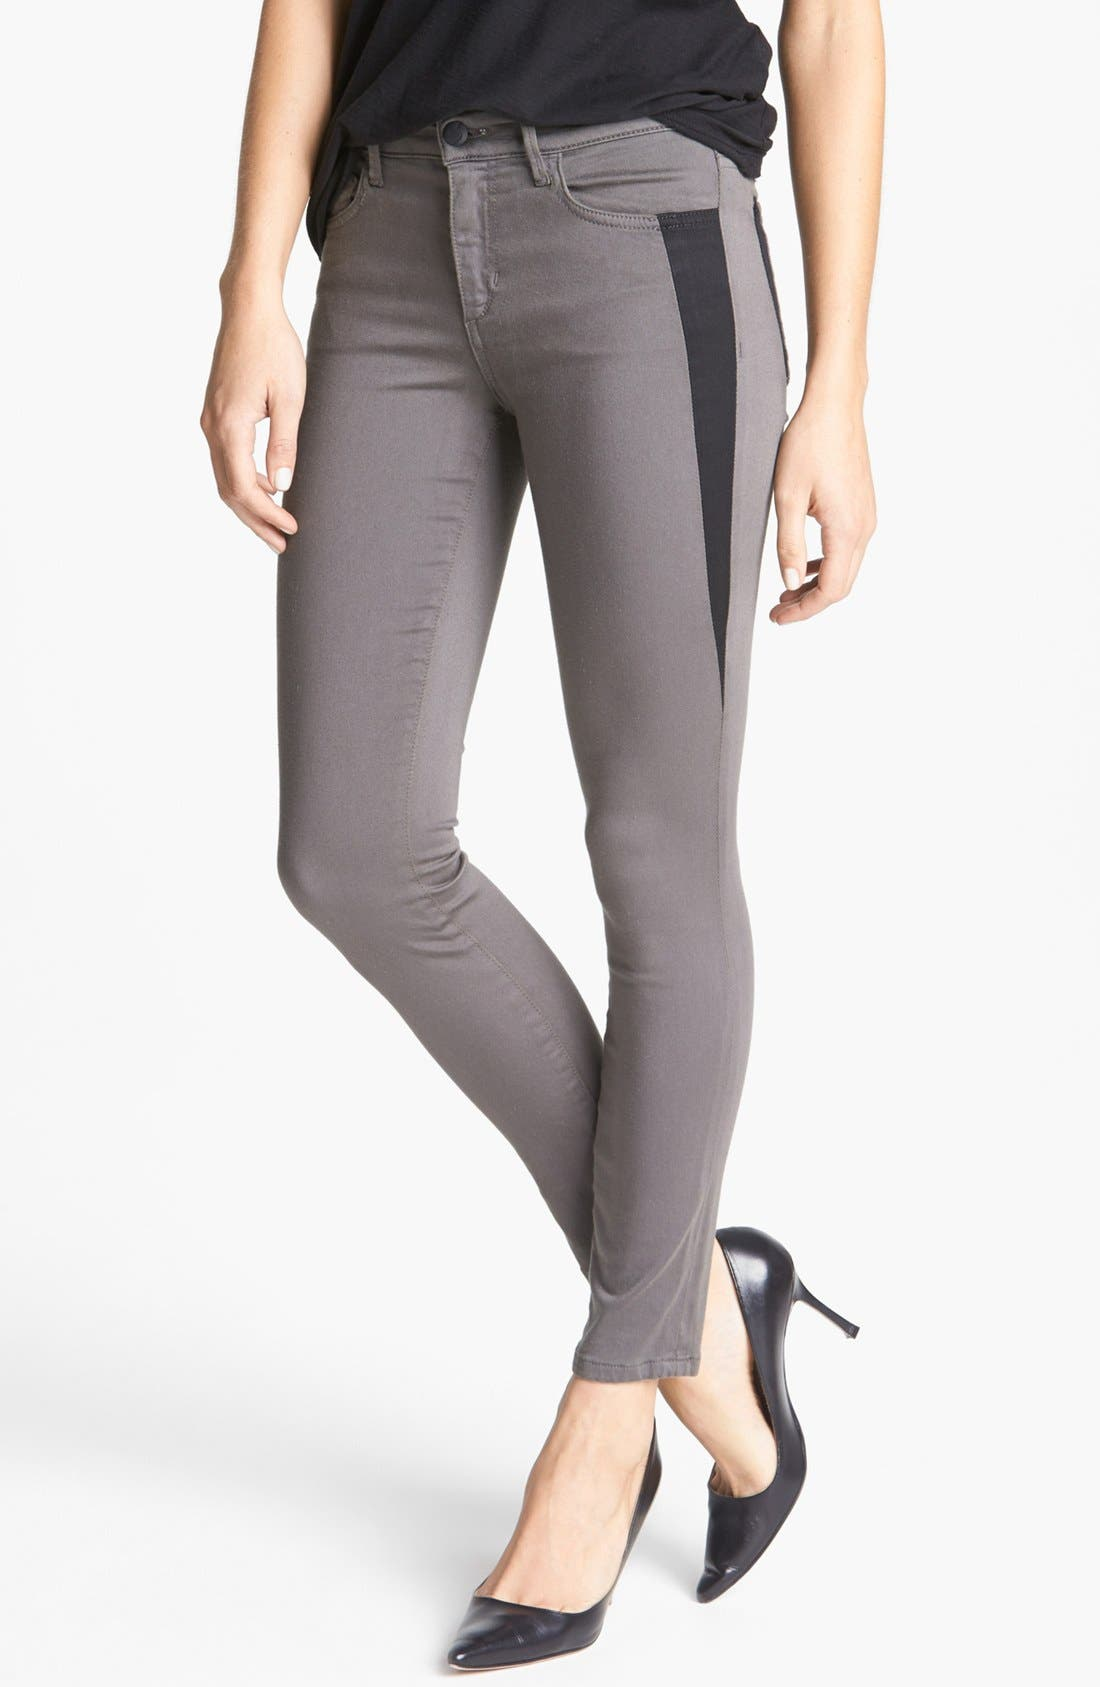 Alternate Image 1 Selected - Joe's 'Oblique' Skinny Ankle Jeans (Charcoal)